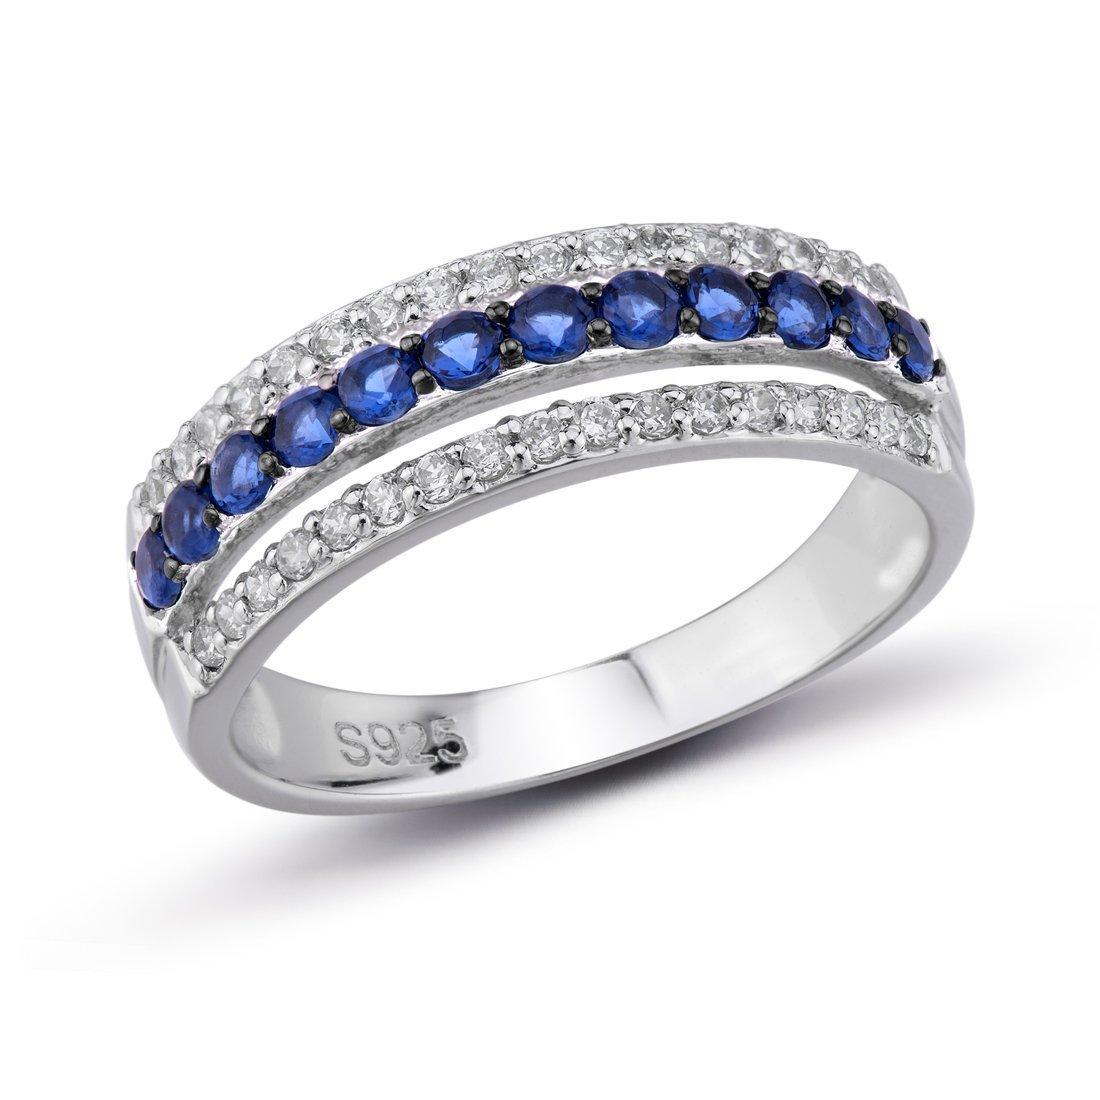 Santuzza 925 Sterling Silver Rings for Women Blue Nano Cubic Zirconia Stones Party Fashion Jewelry (8)